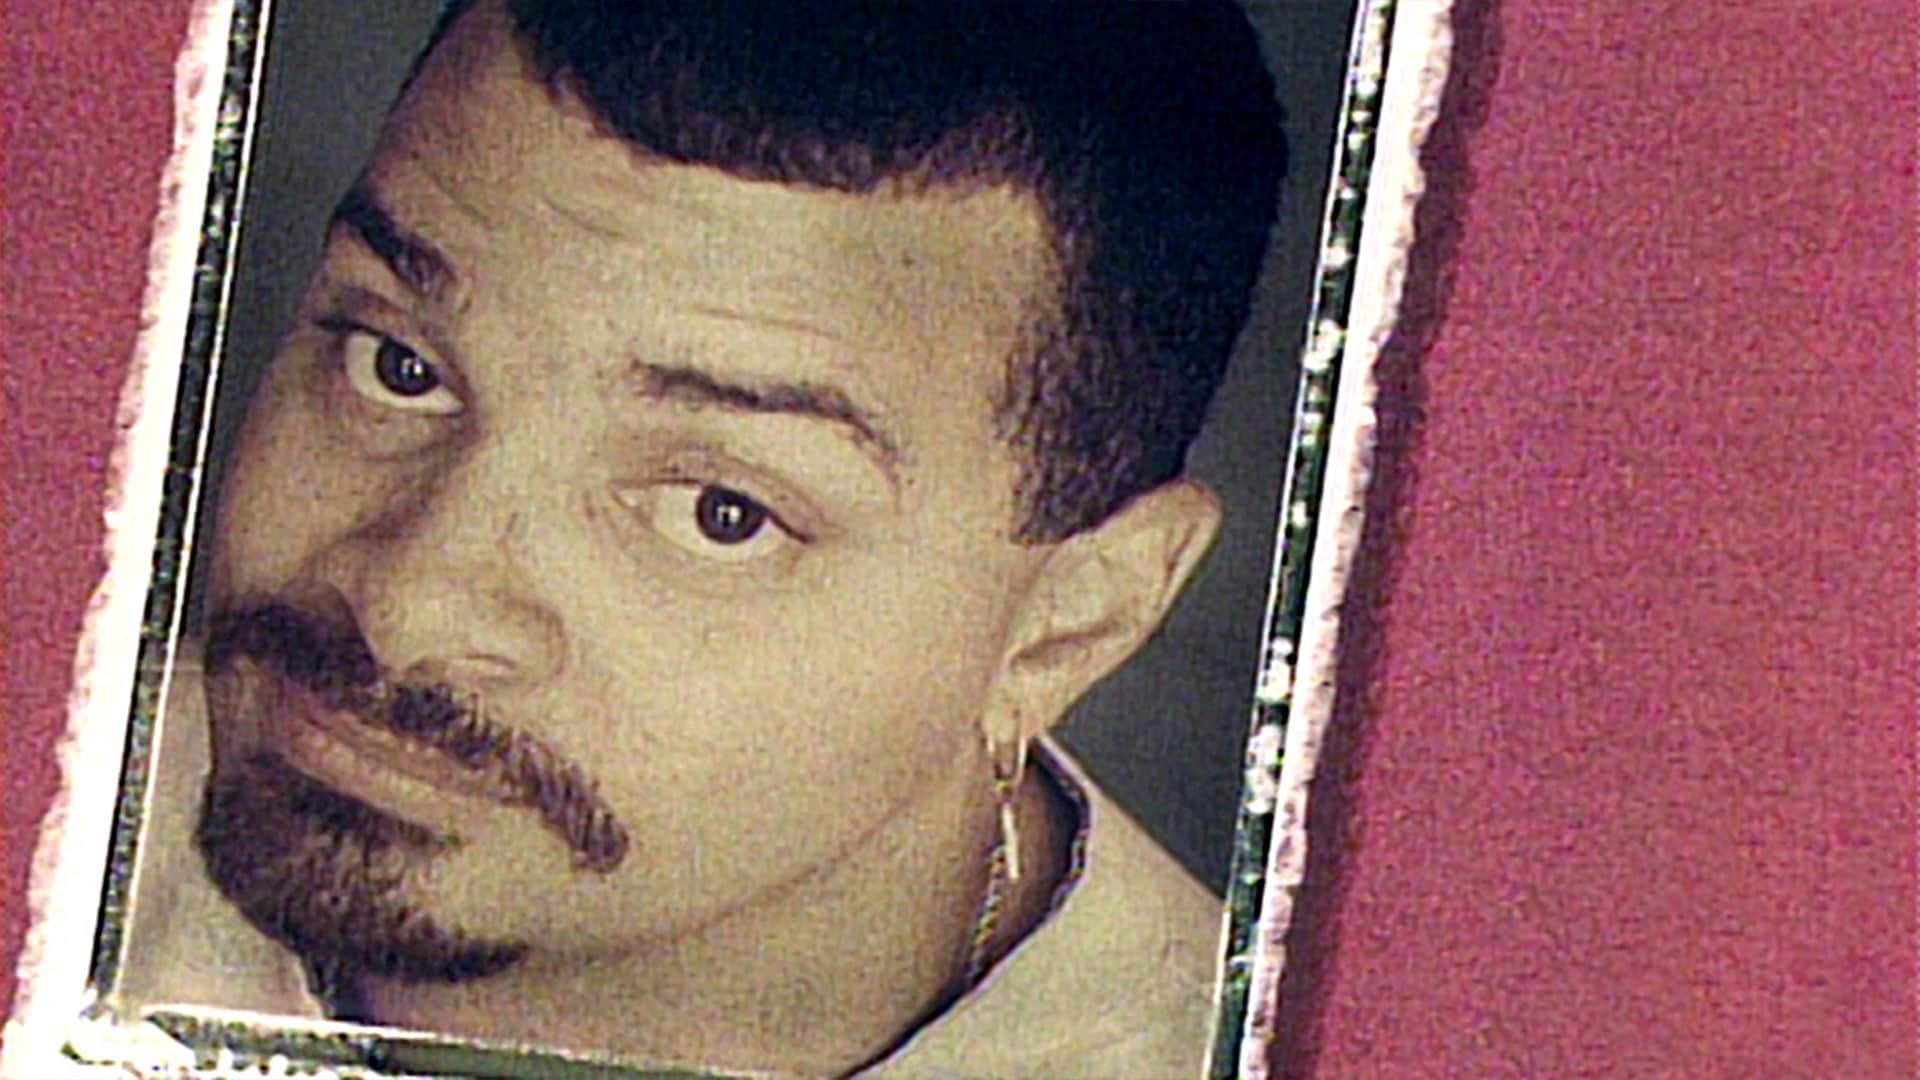 Sinbad: November 21, 1992